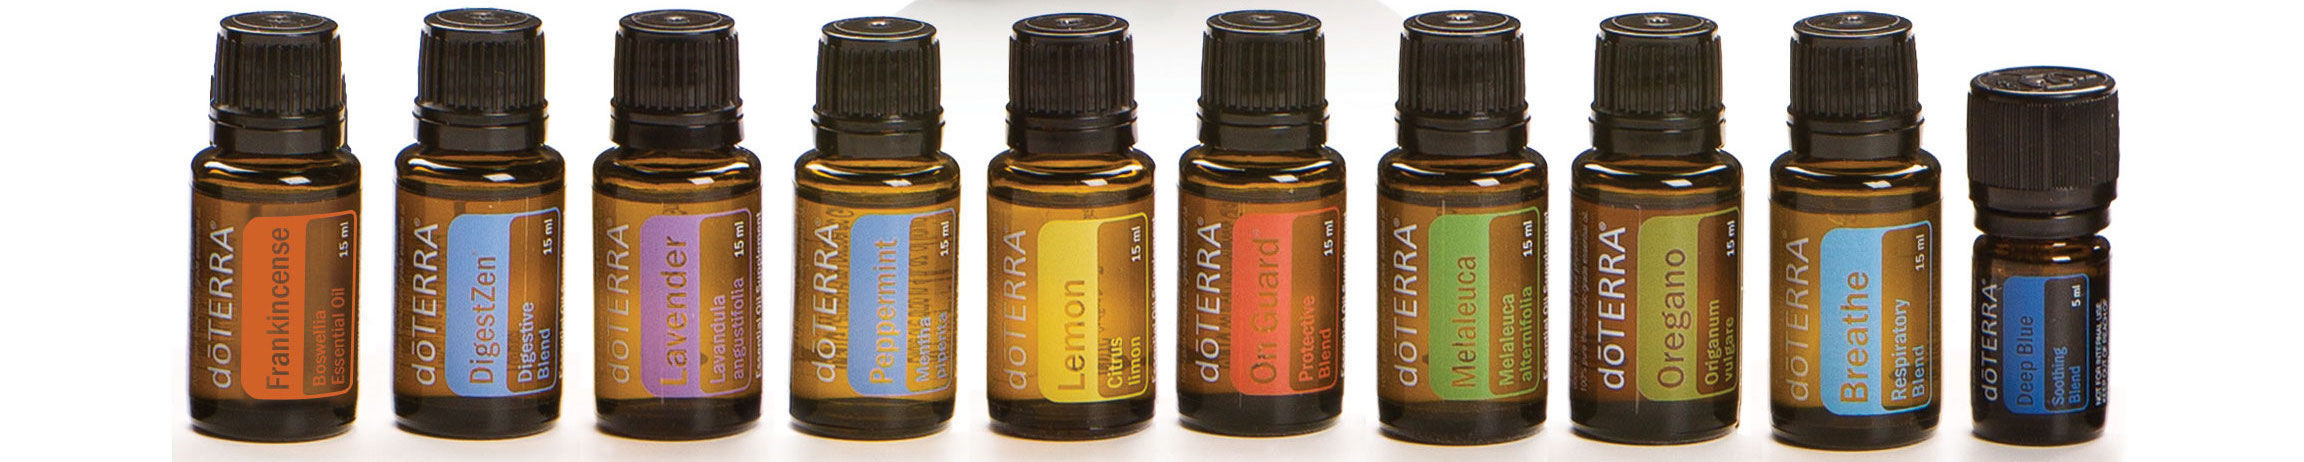 Home_Essentials_Kit_Oils.jpeg